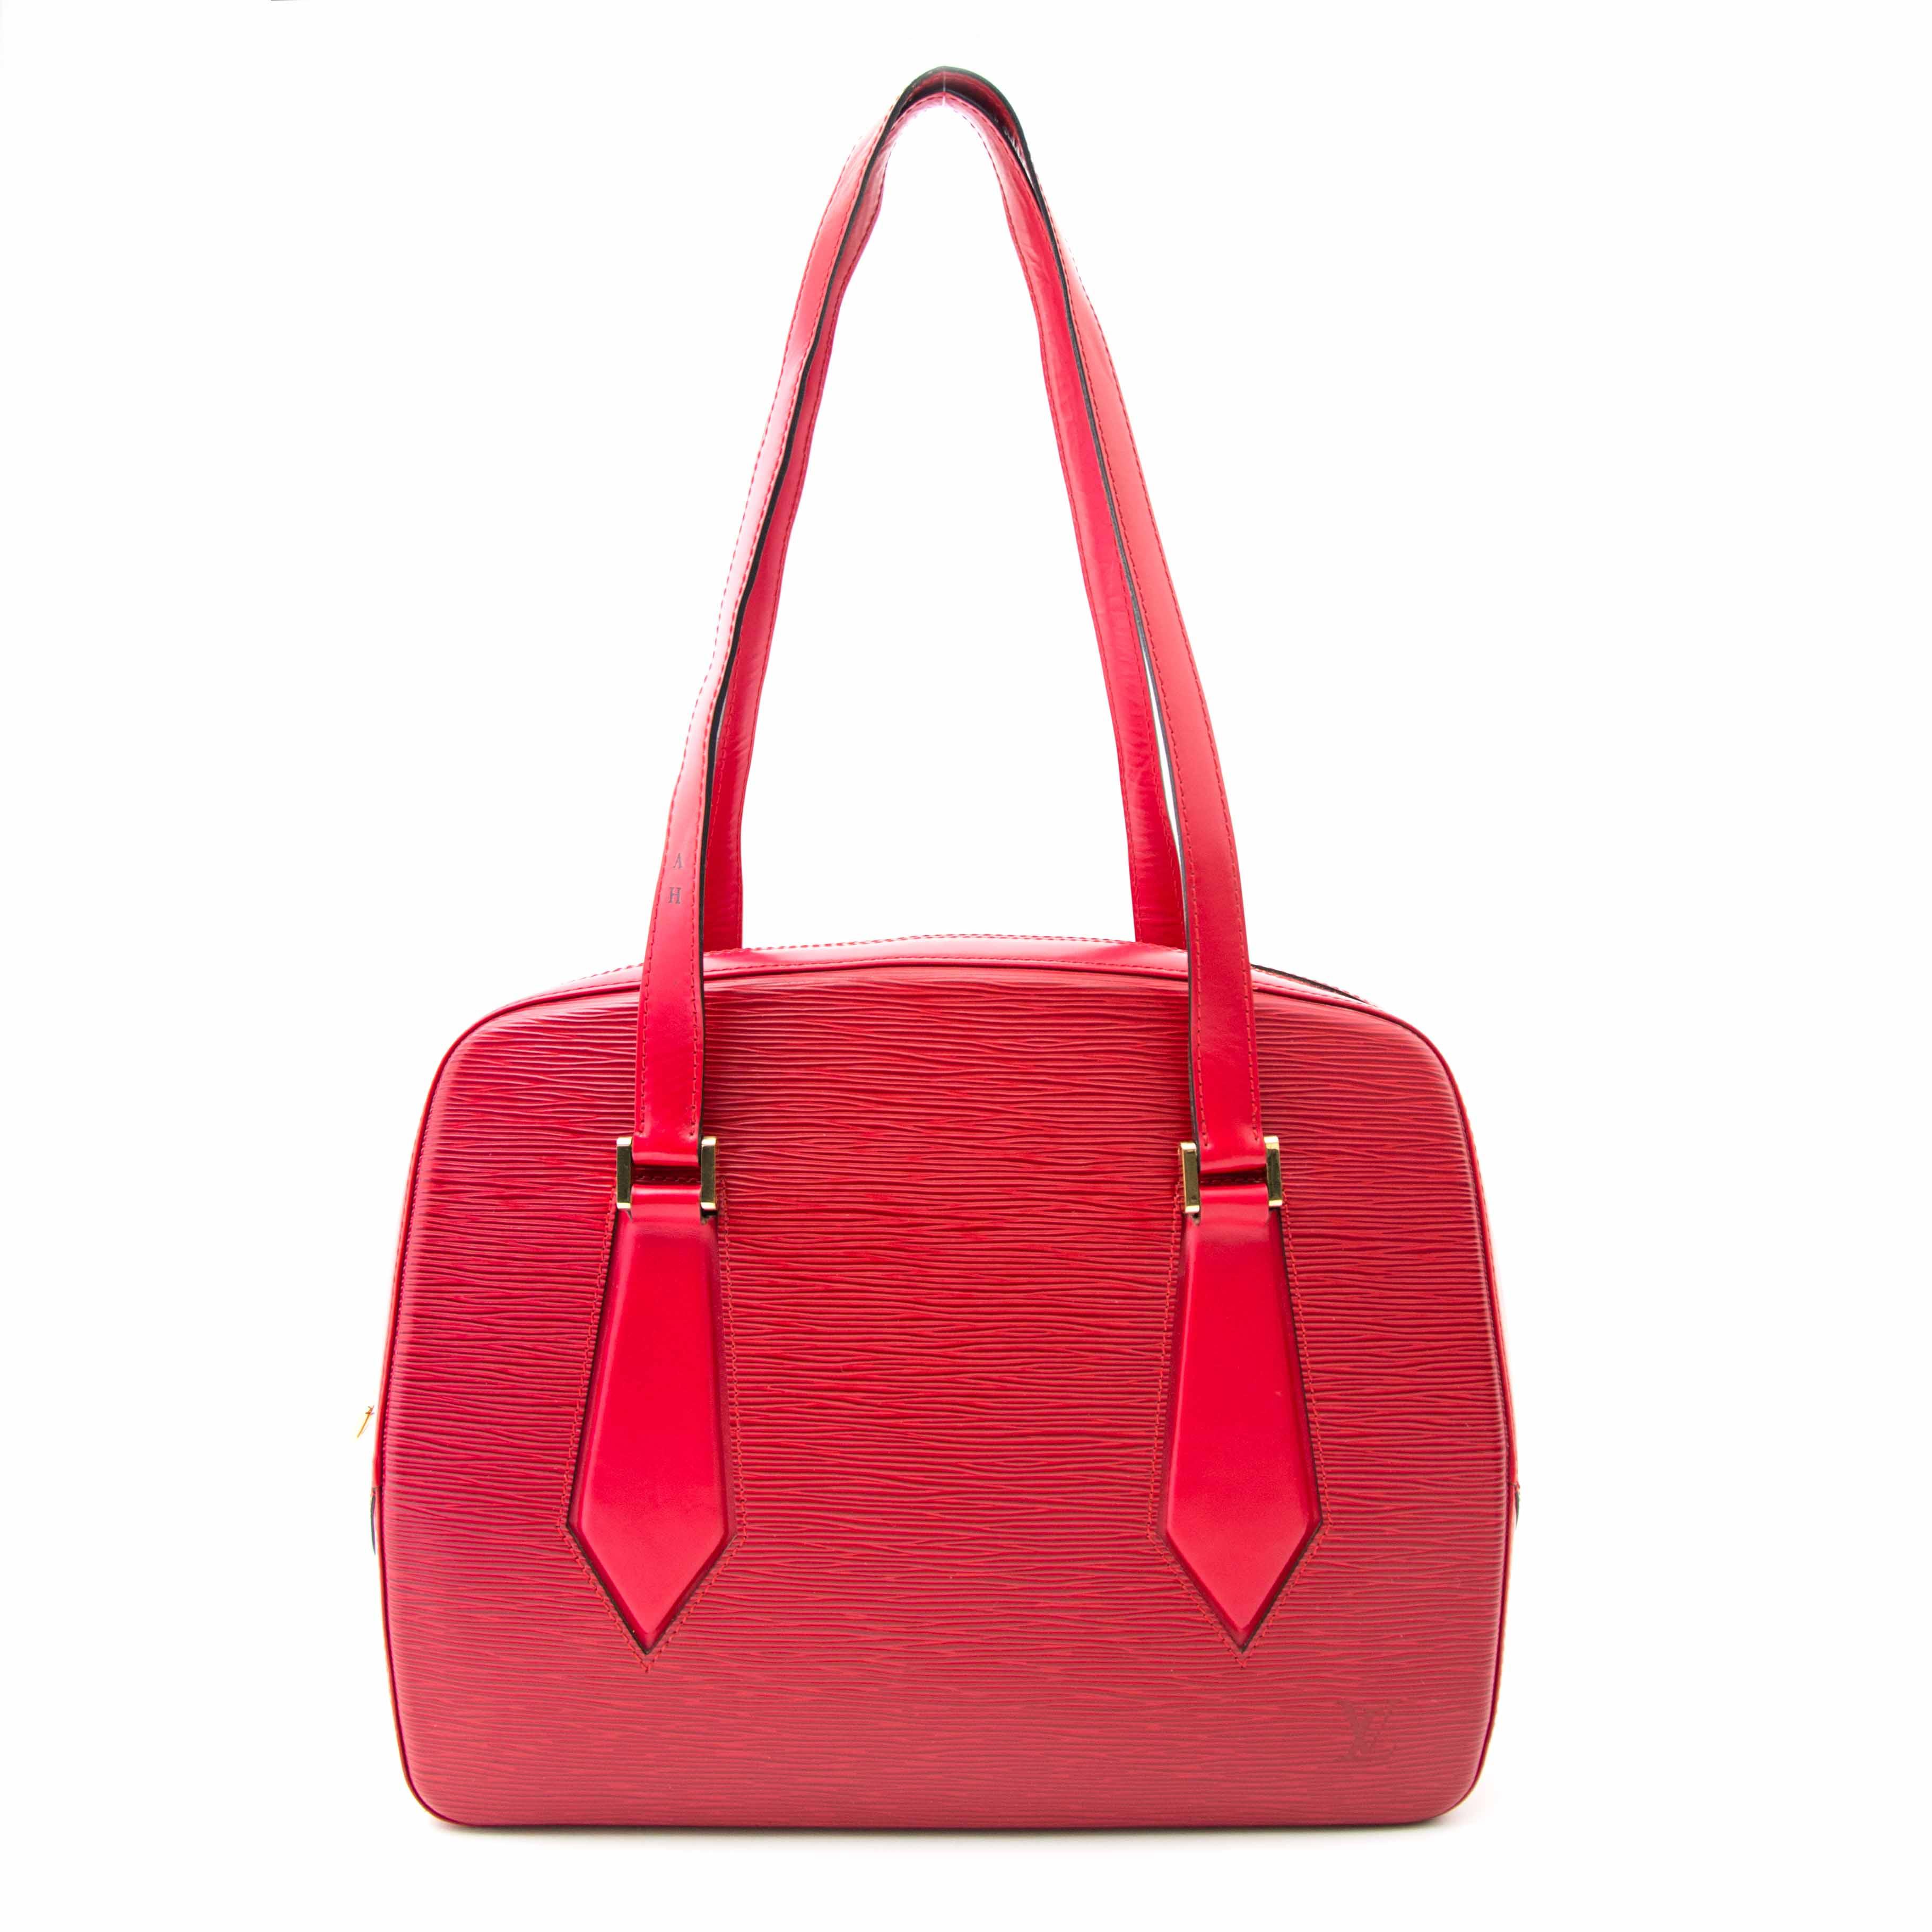 Shop safe online aan de beste prijs Louis Vuitton Red Epi Shoulder Bag